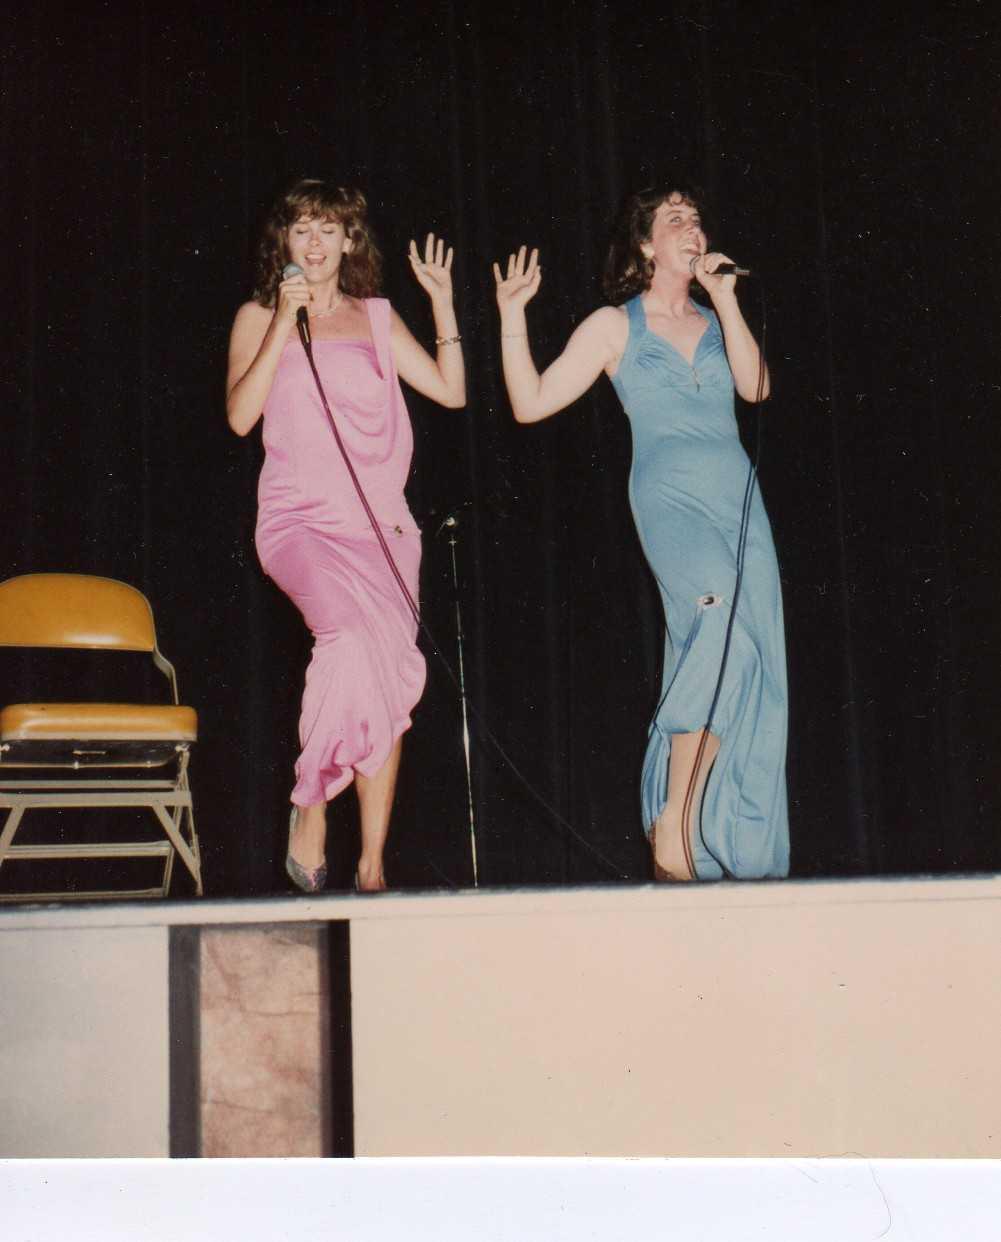 2 The Sweeney Sisters